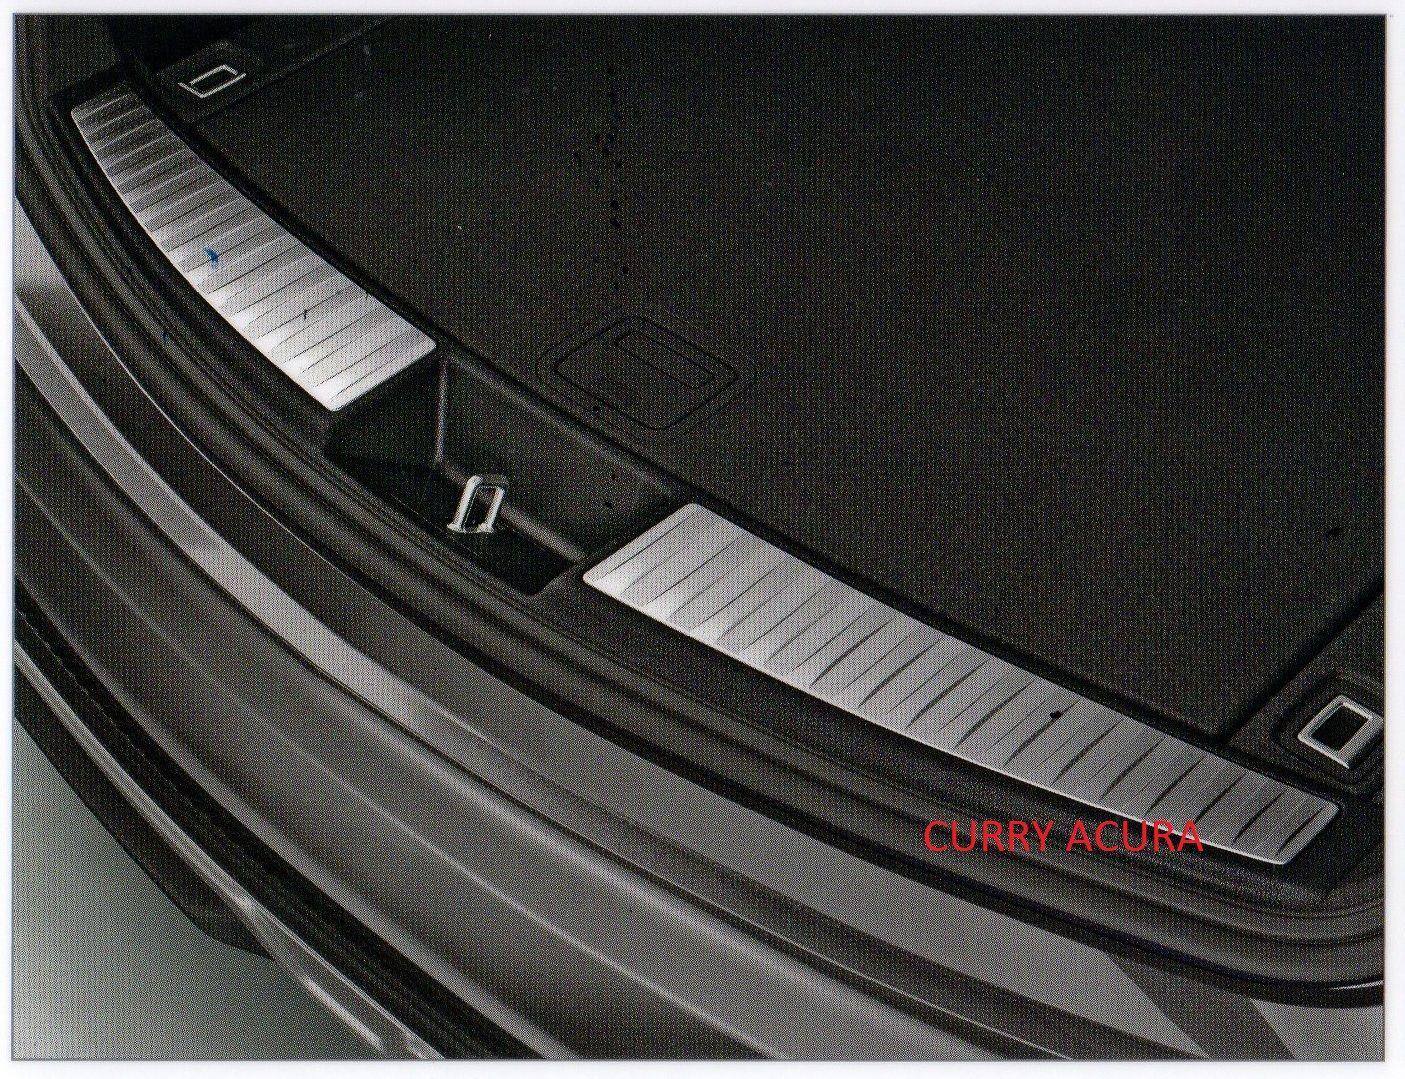 2019 Acura RDX Rear Panel Protector - Acura (08F07-TJB-210)